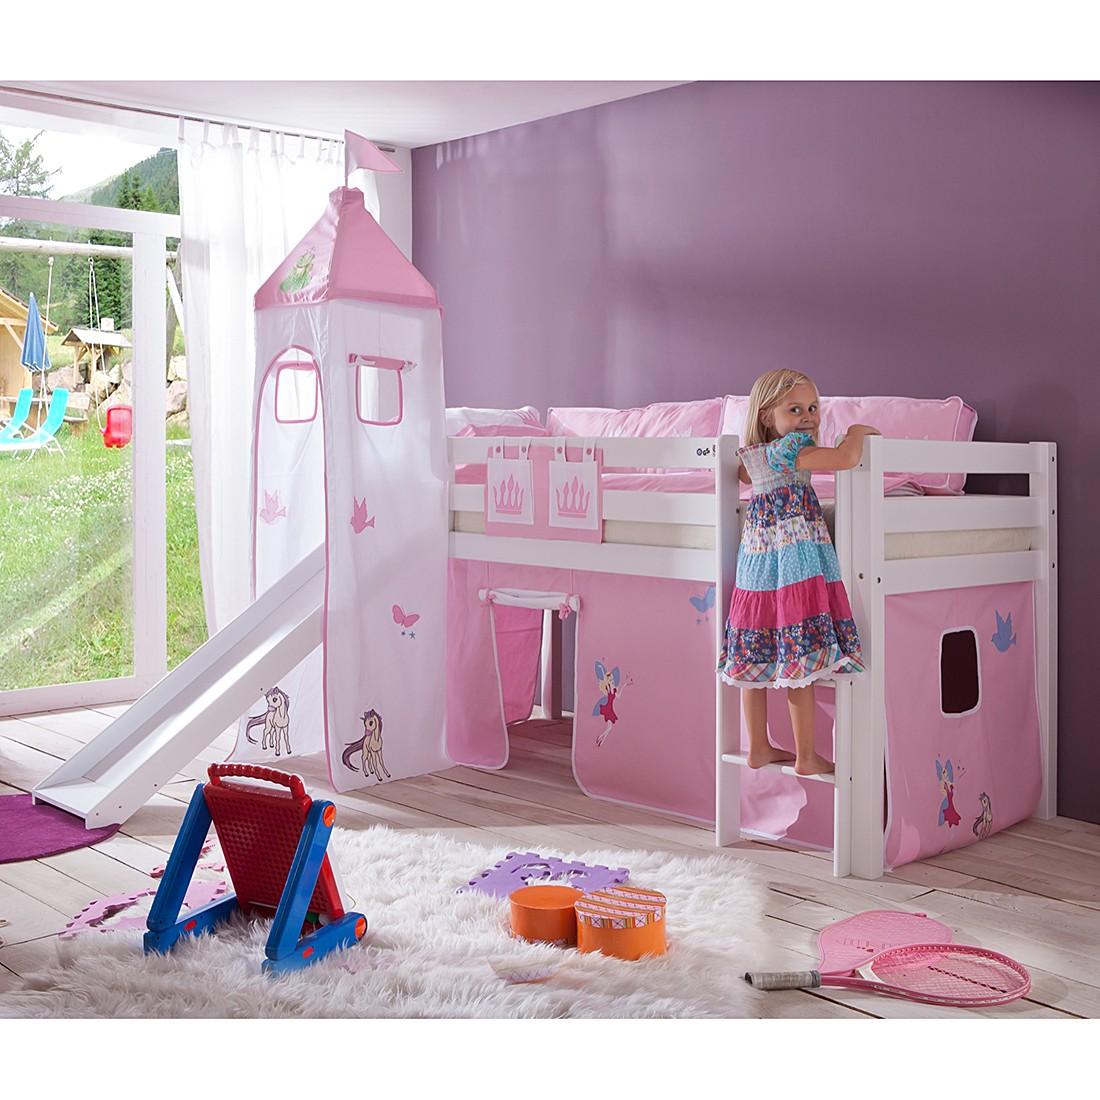 mit rutsche mit rutsche with mit rutsche perfect spielturm din en max podest mit rutsche. Black Bedroom Furniture Sets. Home Design Ideas